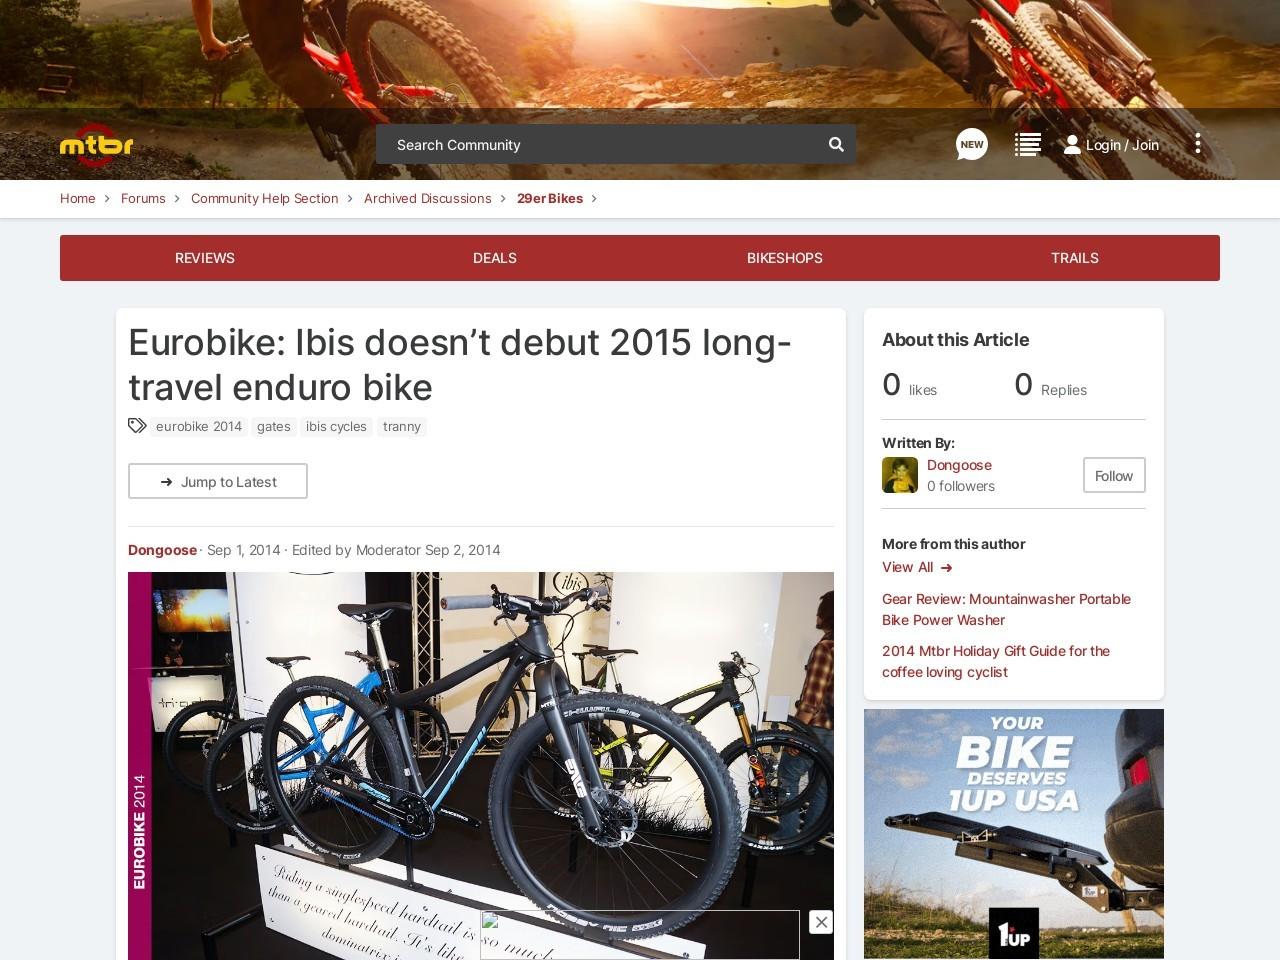 Eurobike: Ibis doesn't debut 2015 long-travel enduro bike …